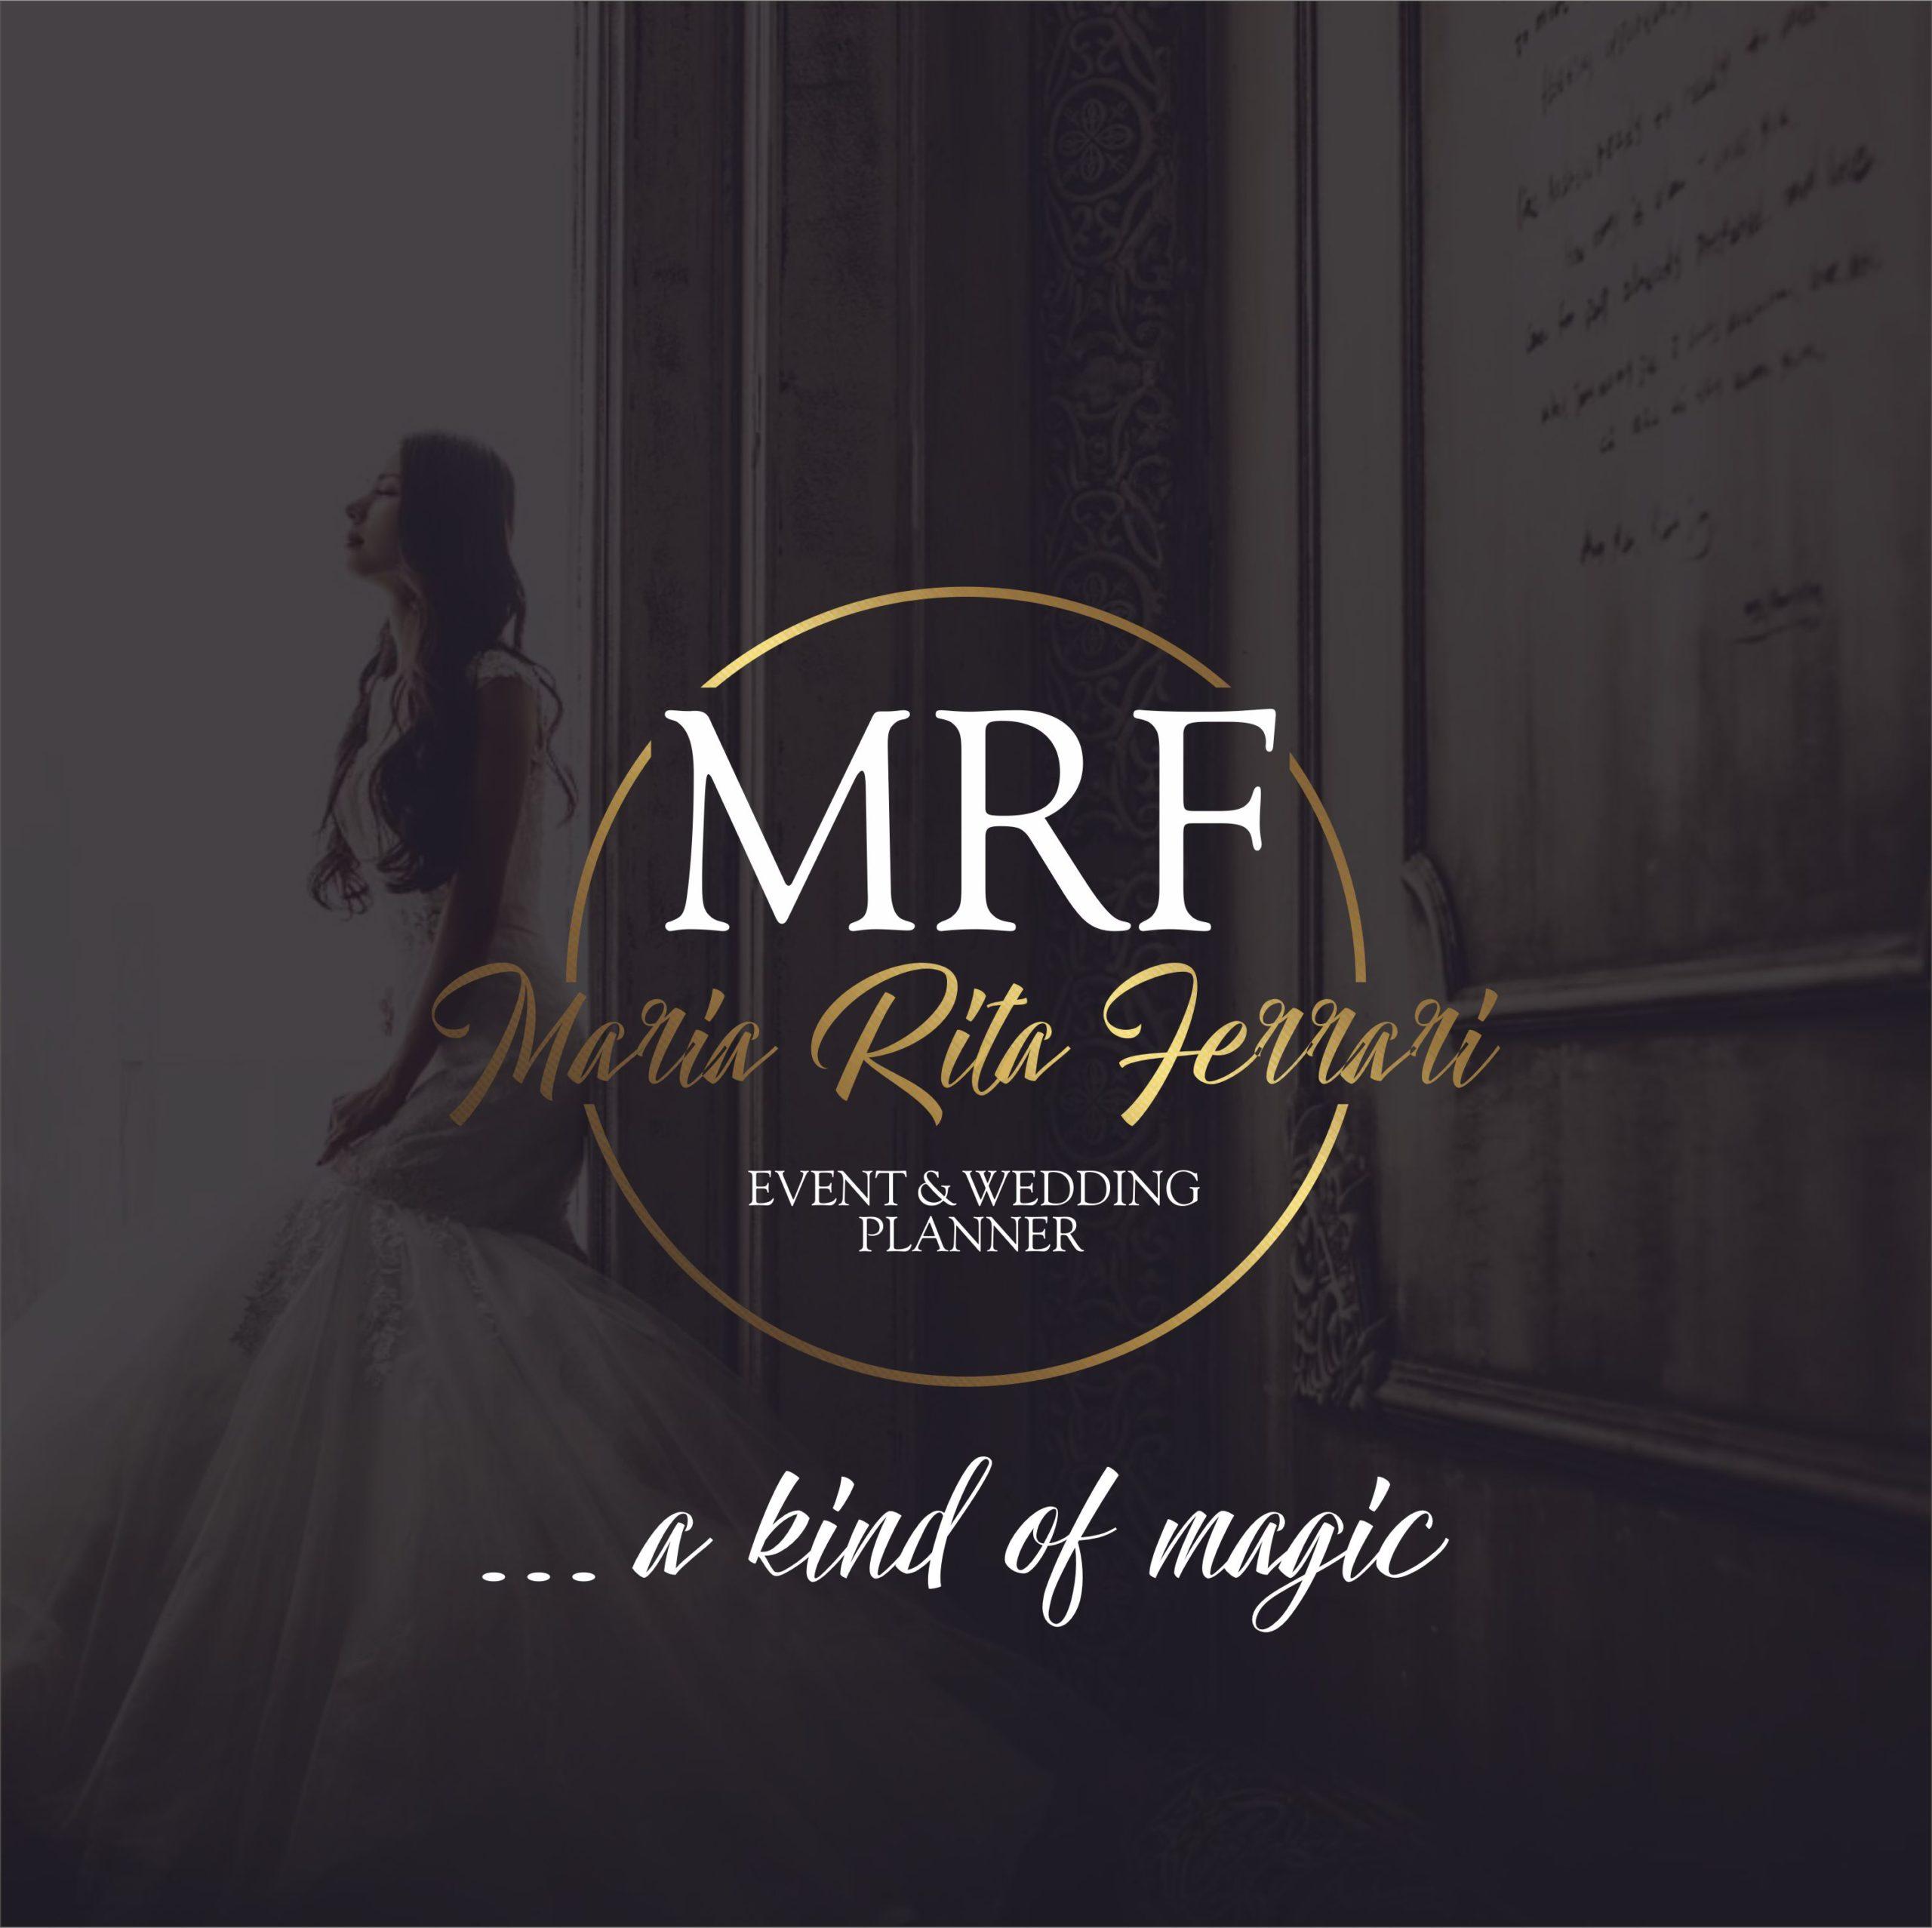 Logo per Maria Rita Ferrari - event & wedding planner | MASTROiNCHIOSTRO